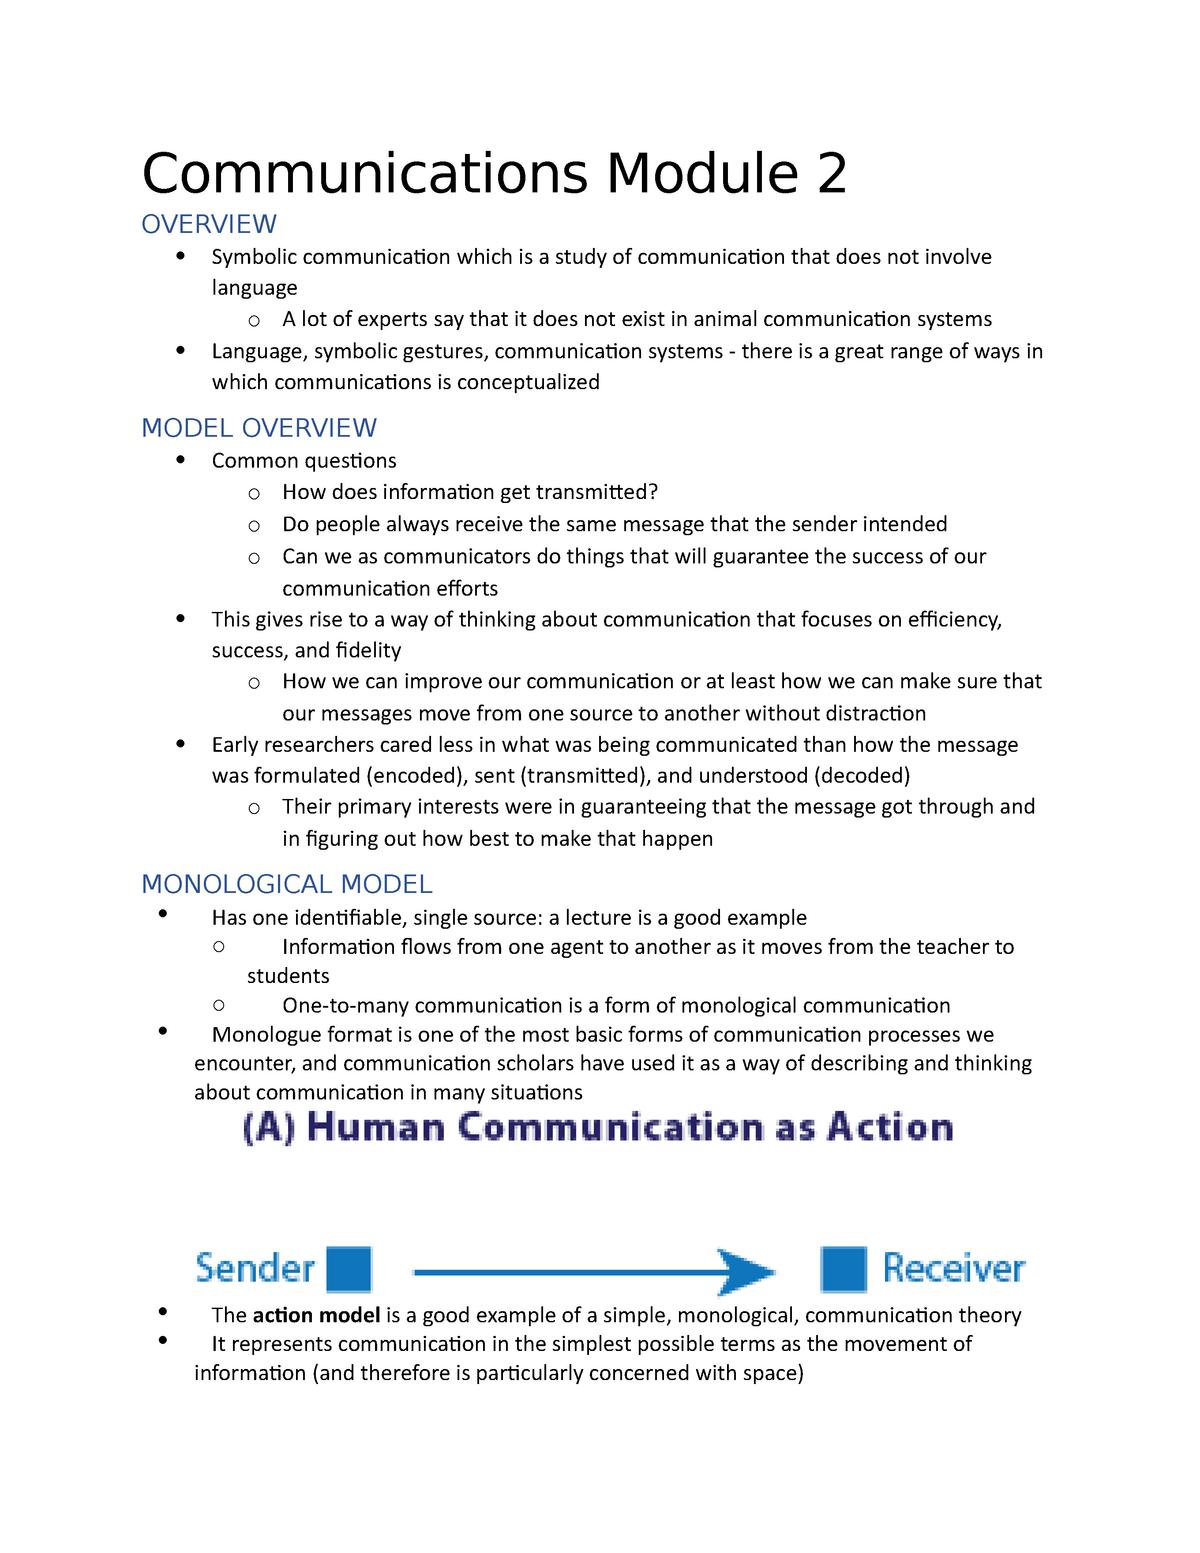 Communications Module 2 - Cmns 110 - SFU - StuDocu